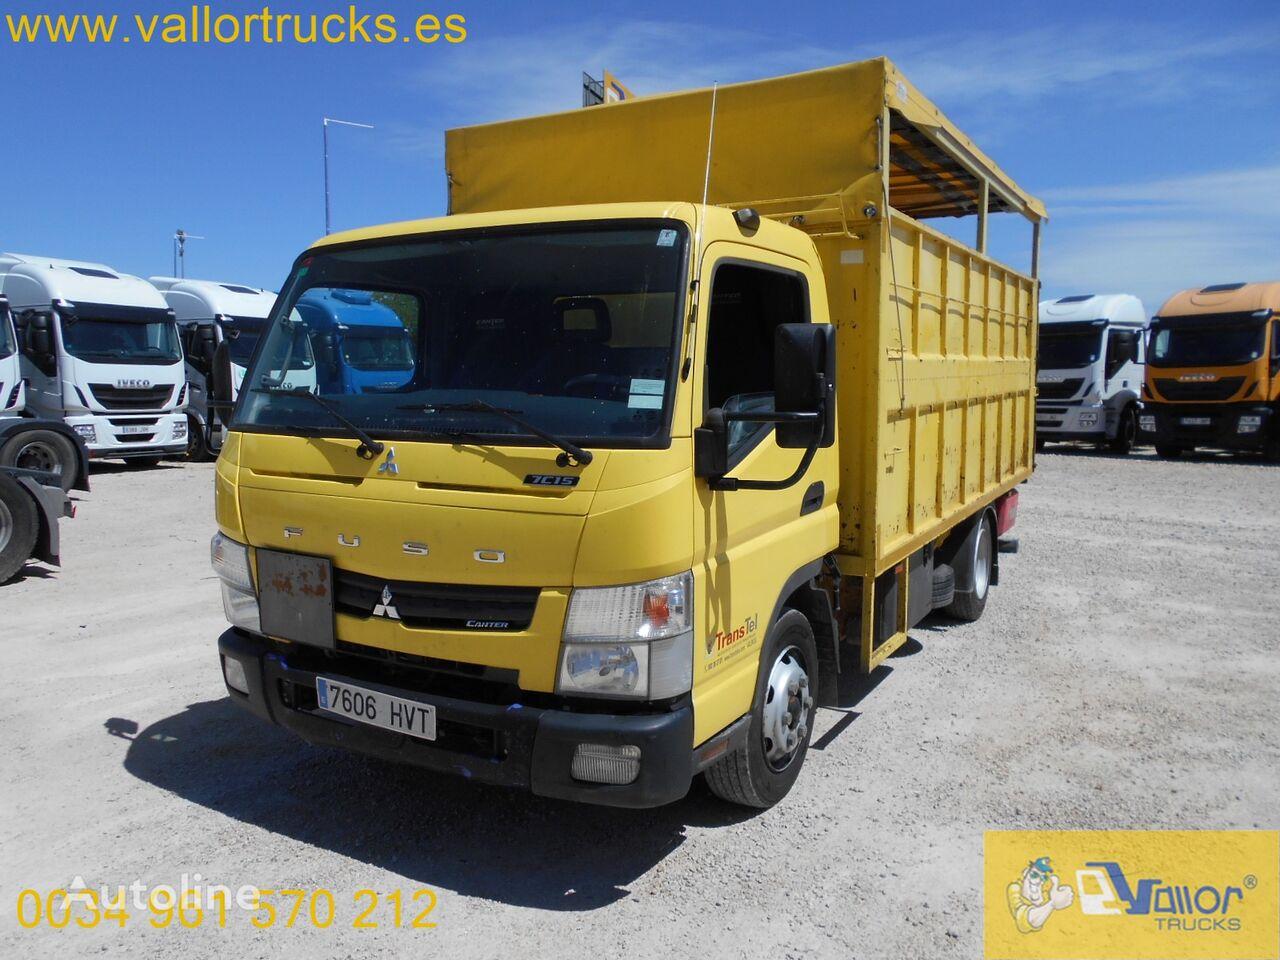 ISUZU CANTER flatbed truck < 3.5t